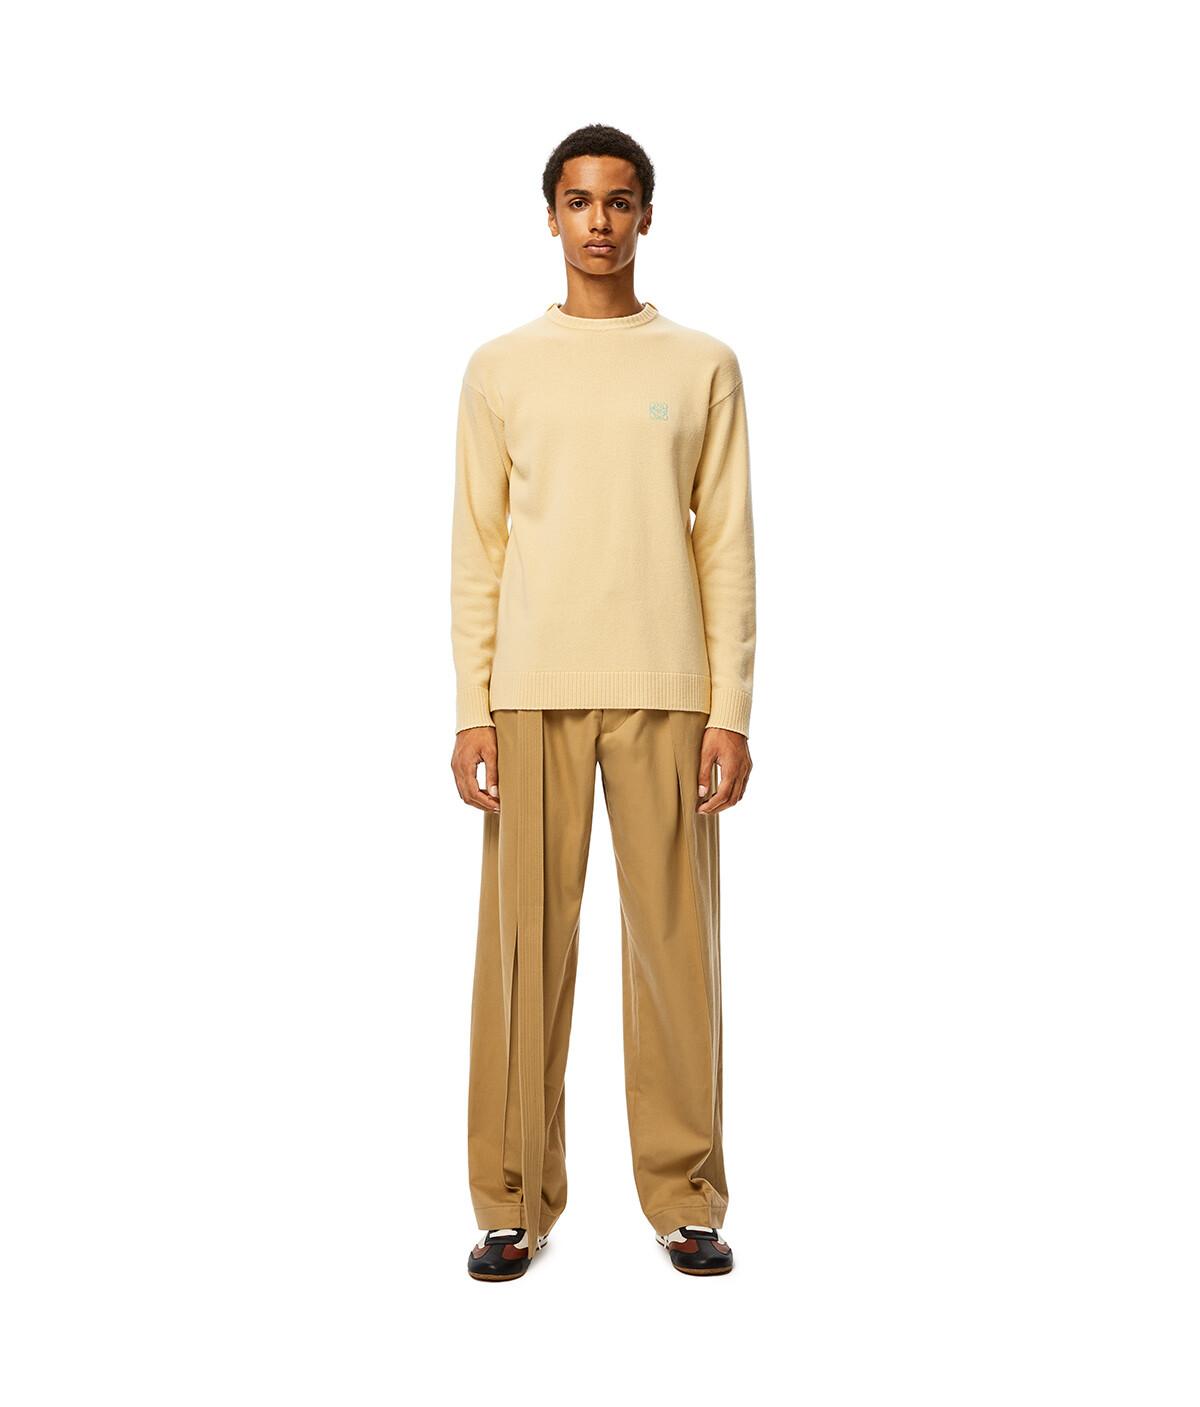 LOEWE Anagram Sweater Amarillo Claro front